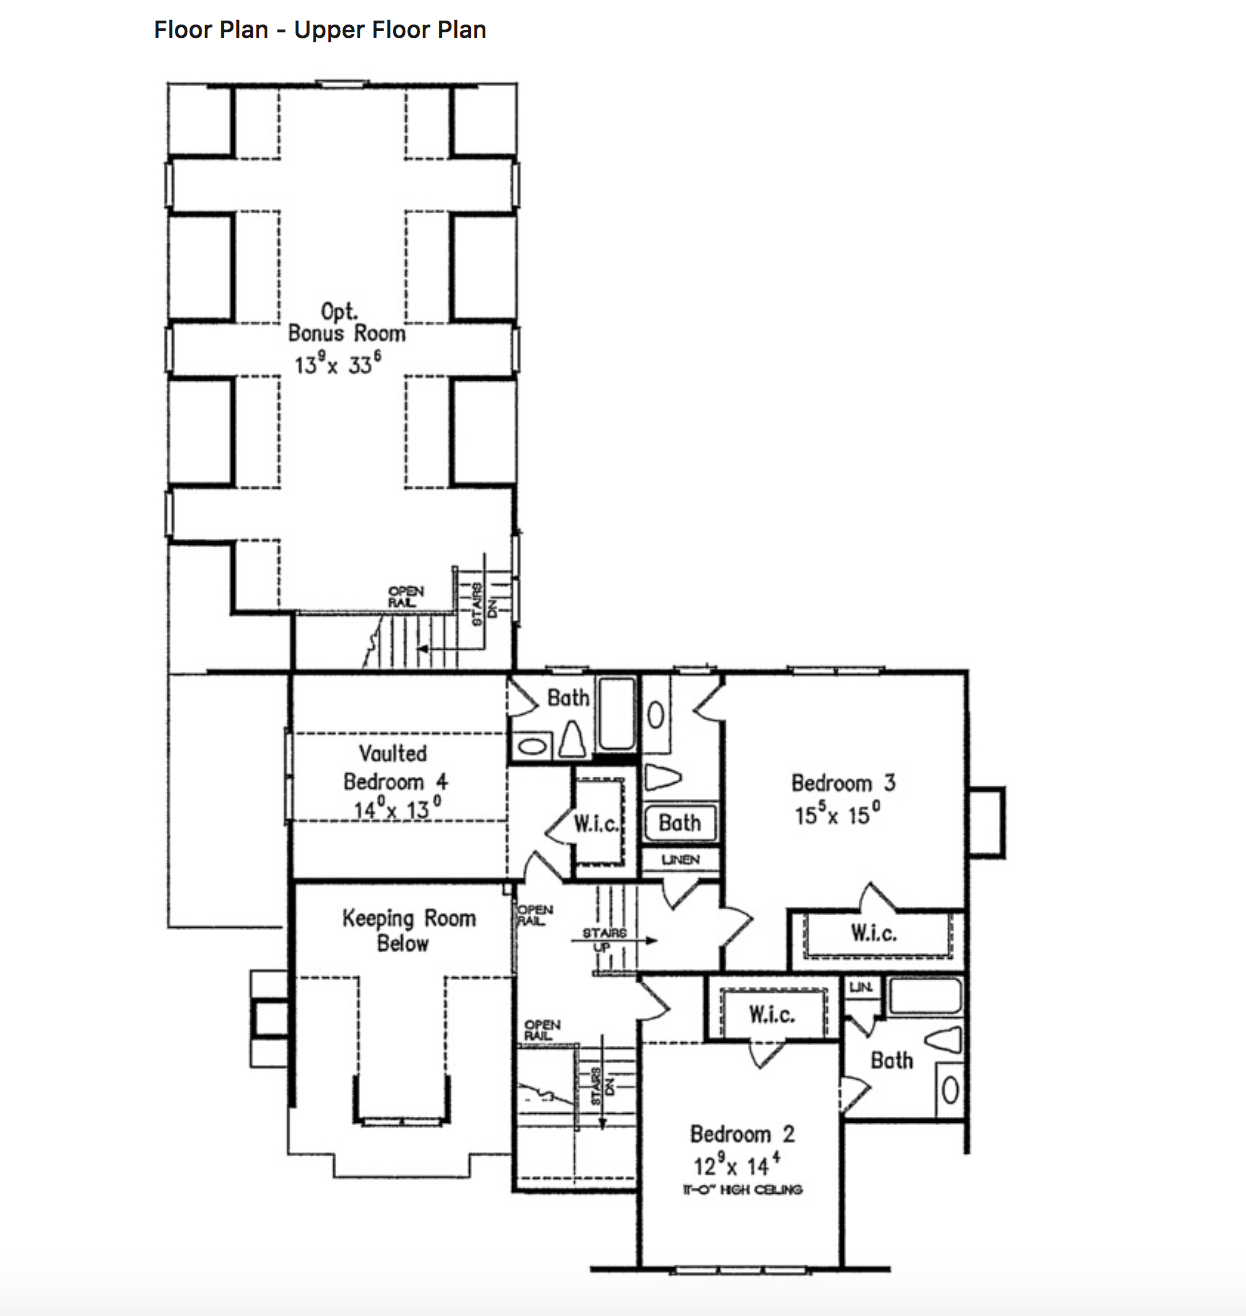 craftsman-upper-level-floor-plan-1.png